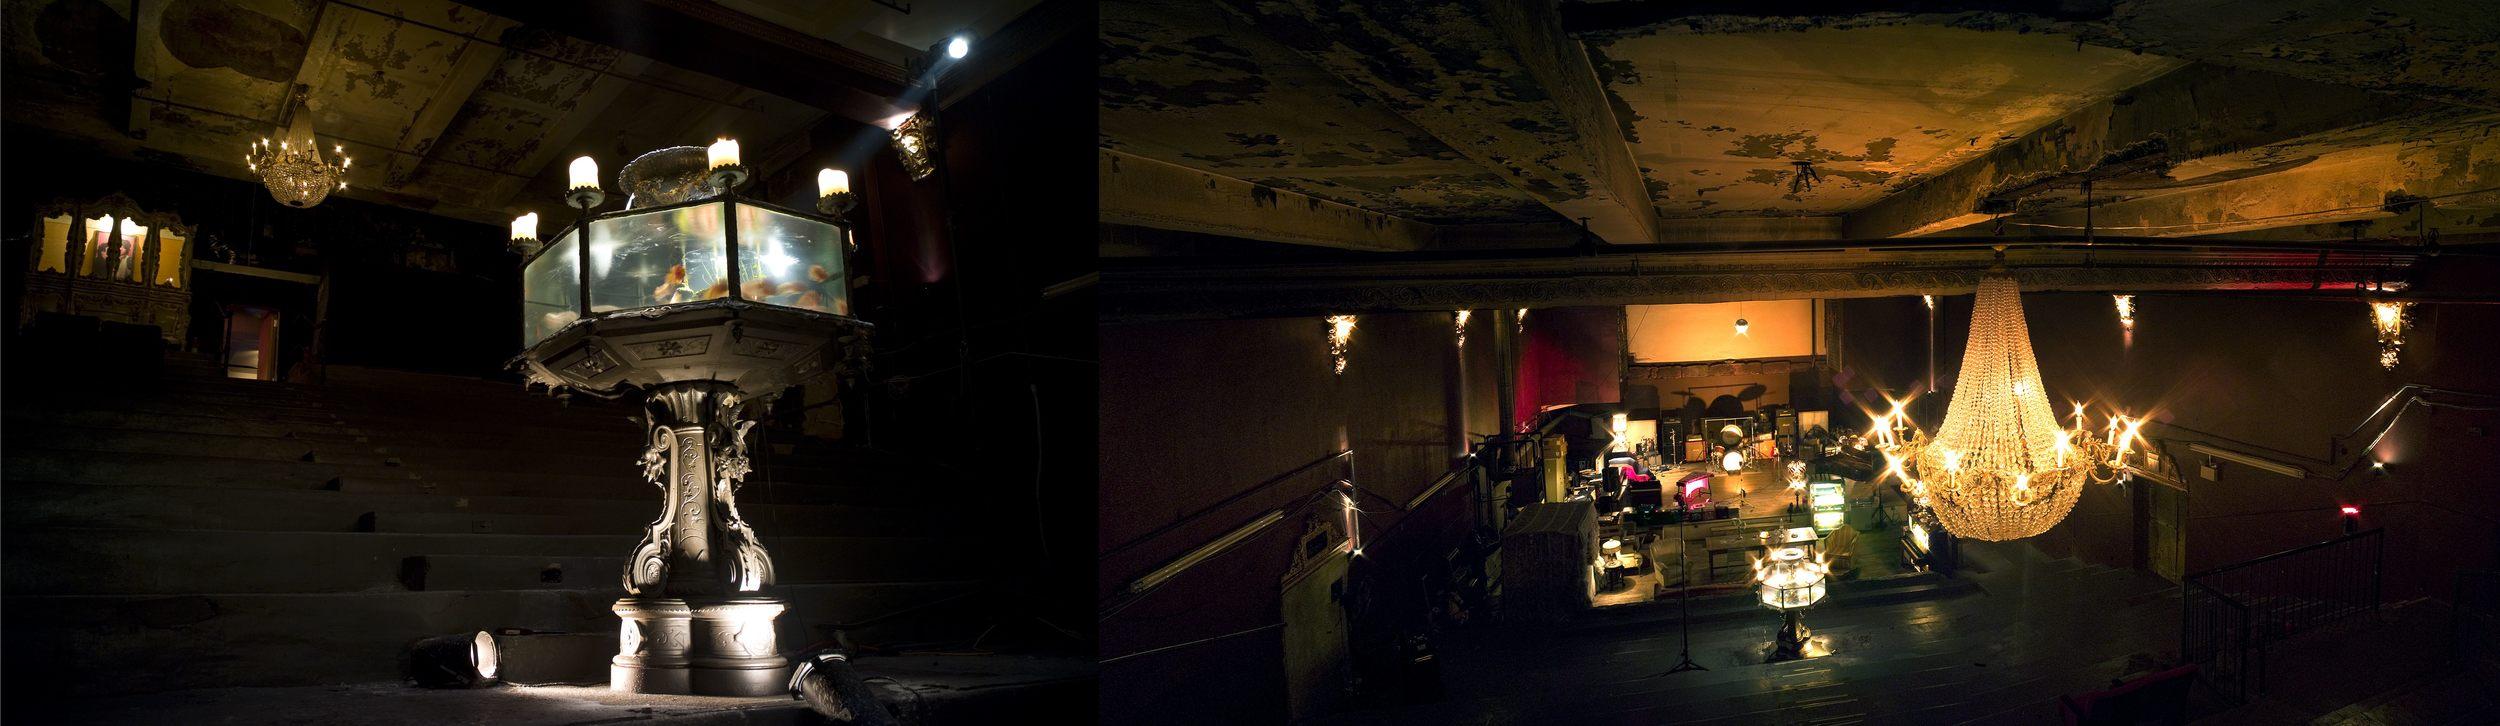 J. Ralph - The Theater @ The Rumor Mill - Credit Photo by Brandon Ralph Copyright 2014.jpg